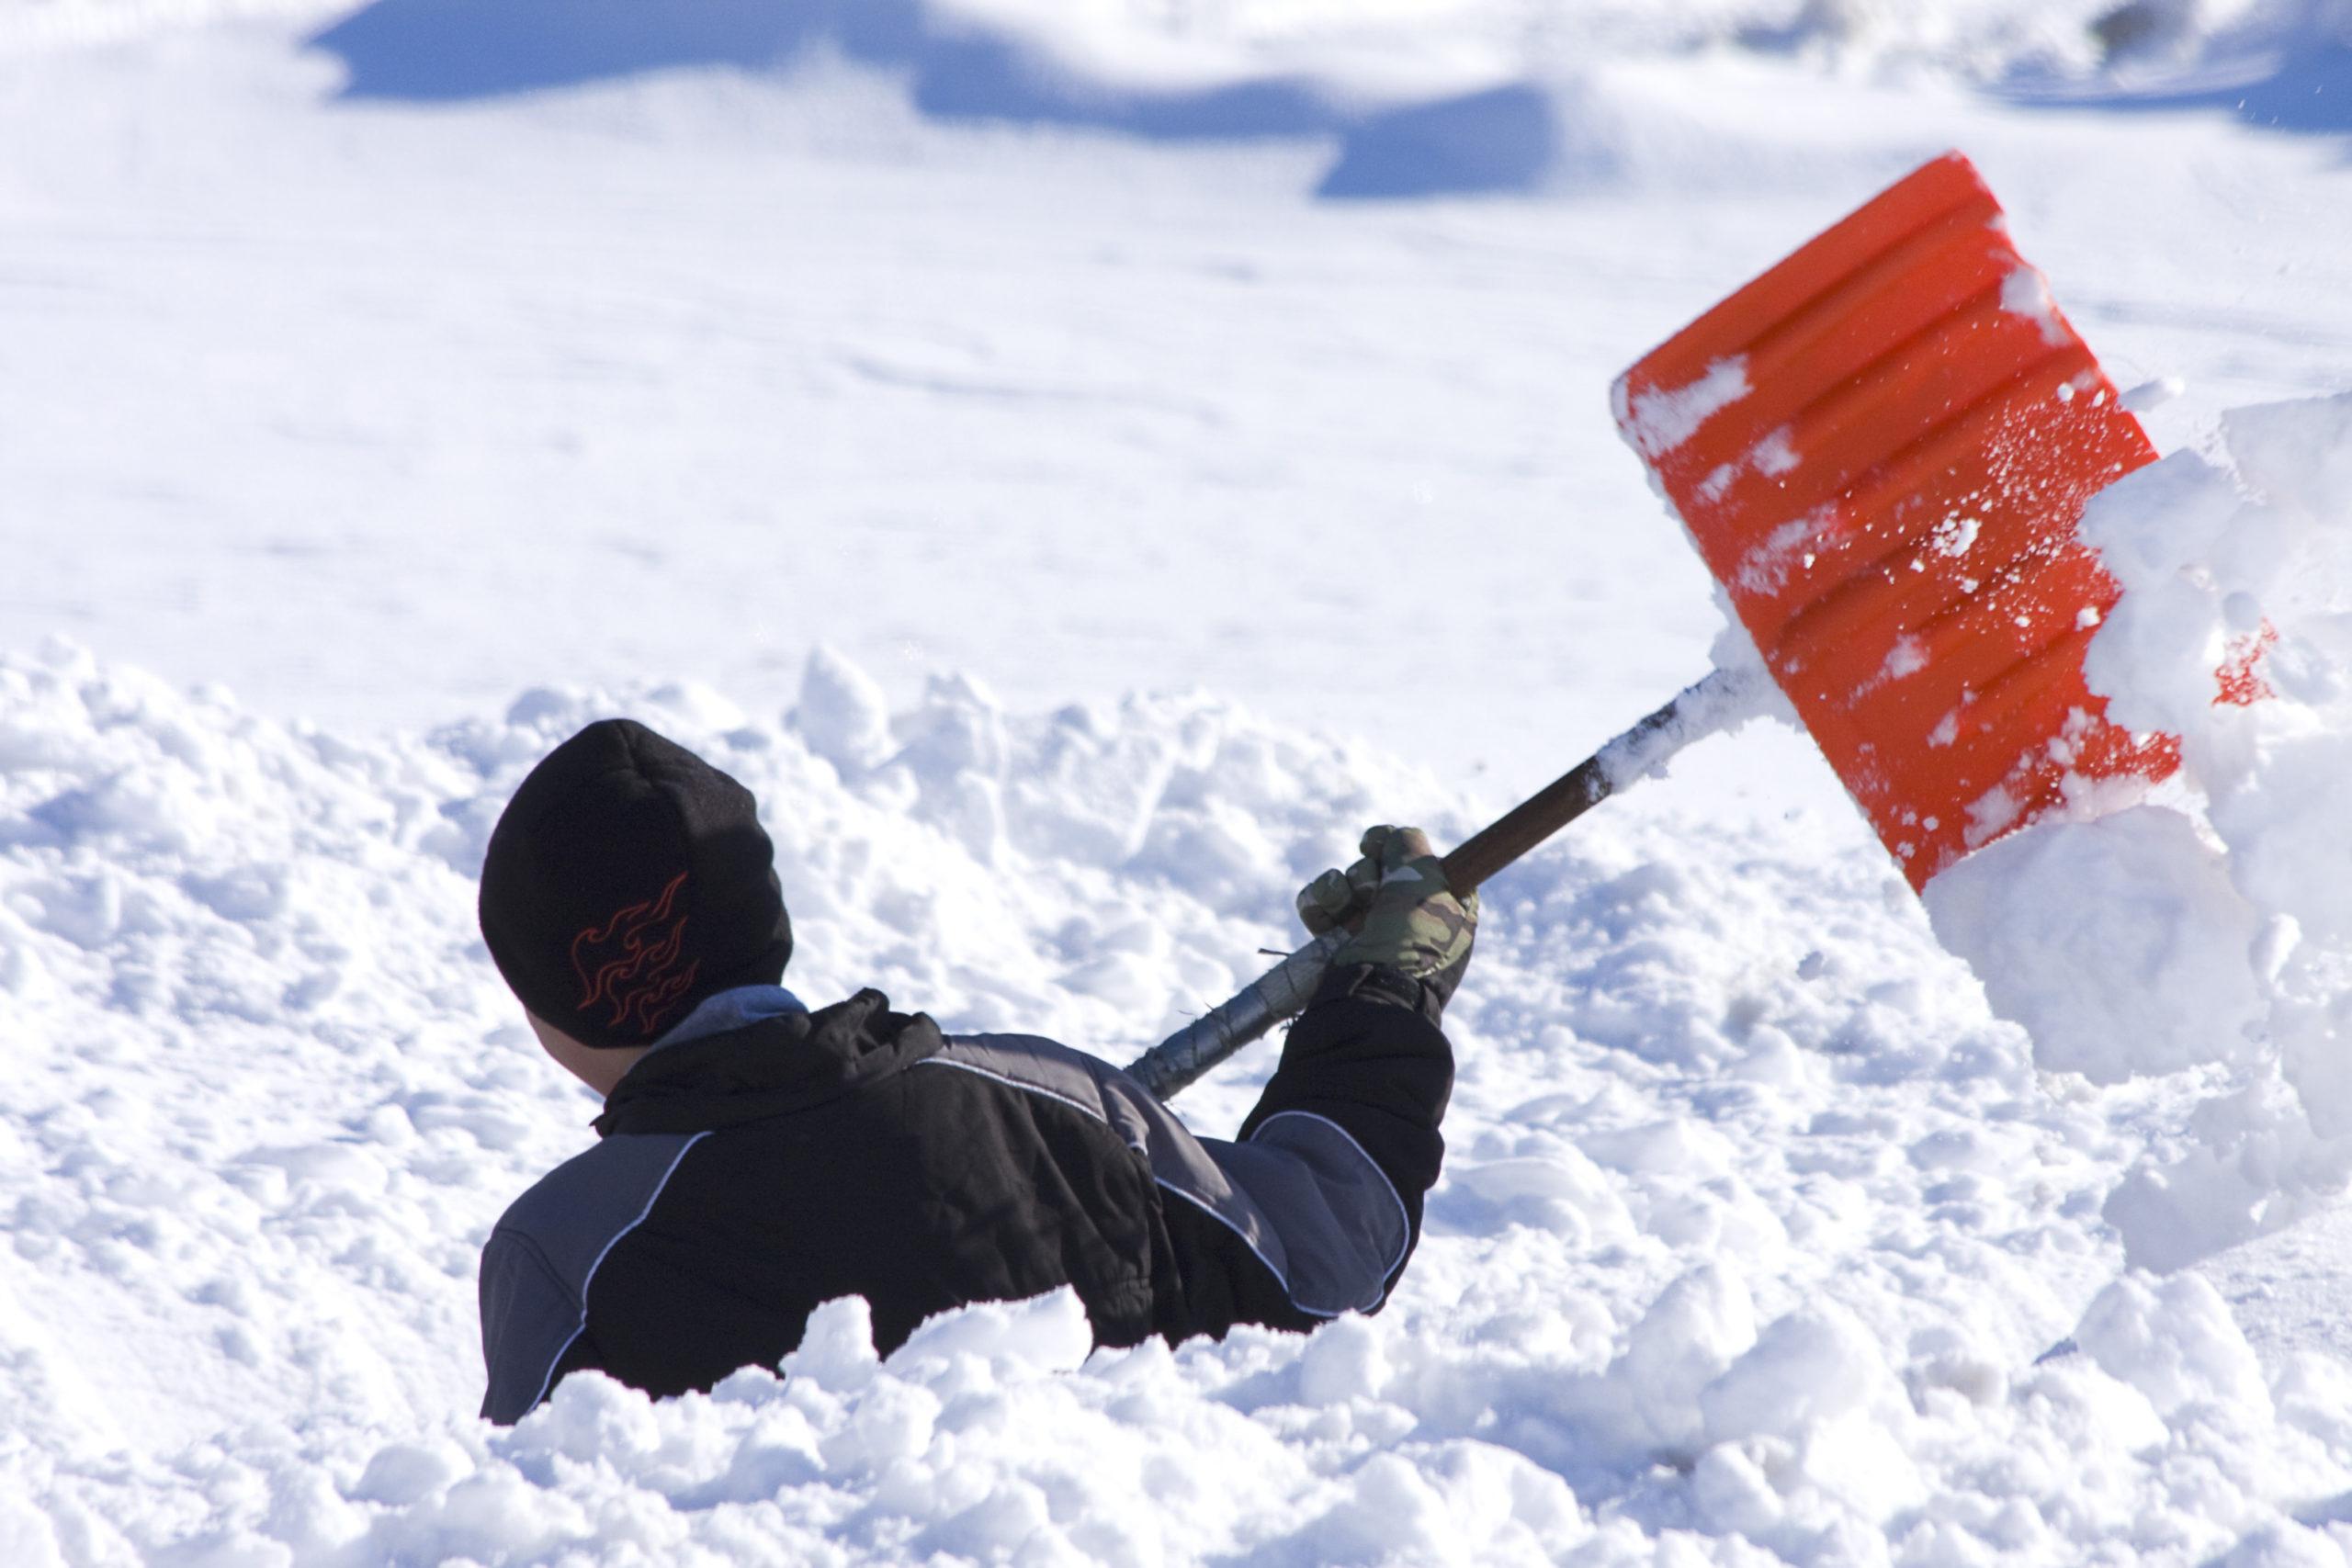 Economic News Roundup and snow shoveling markets